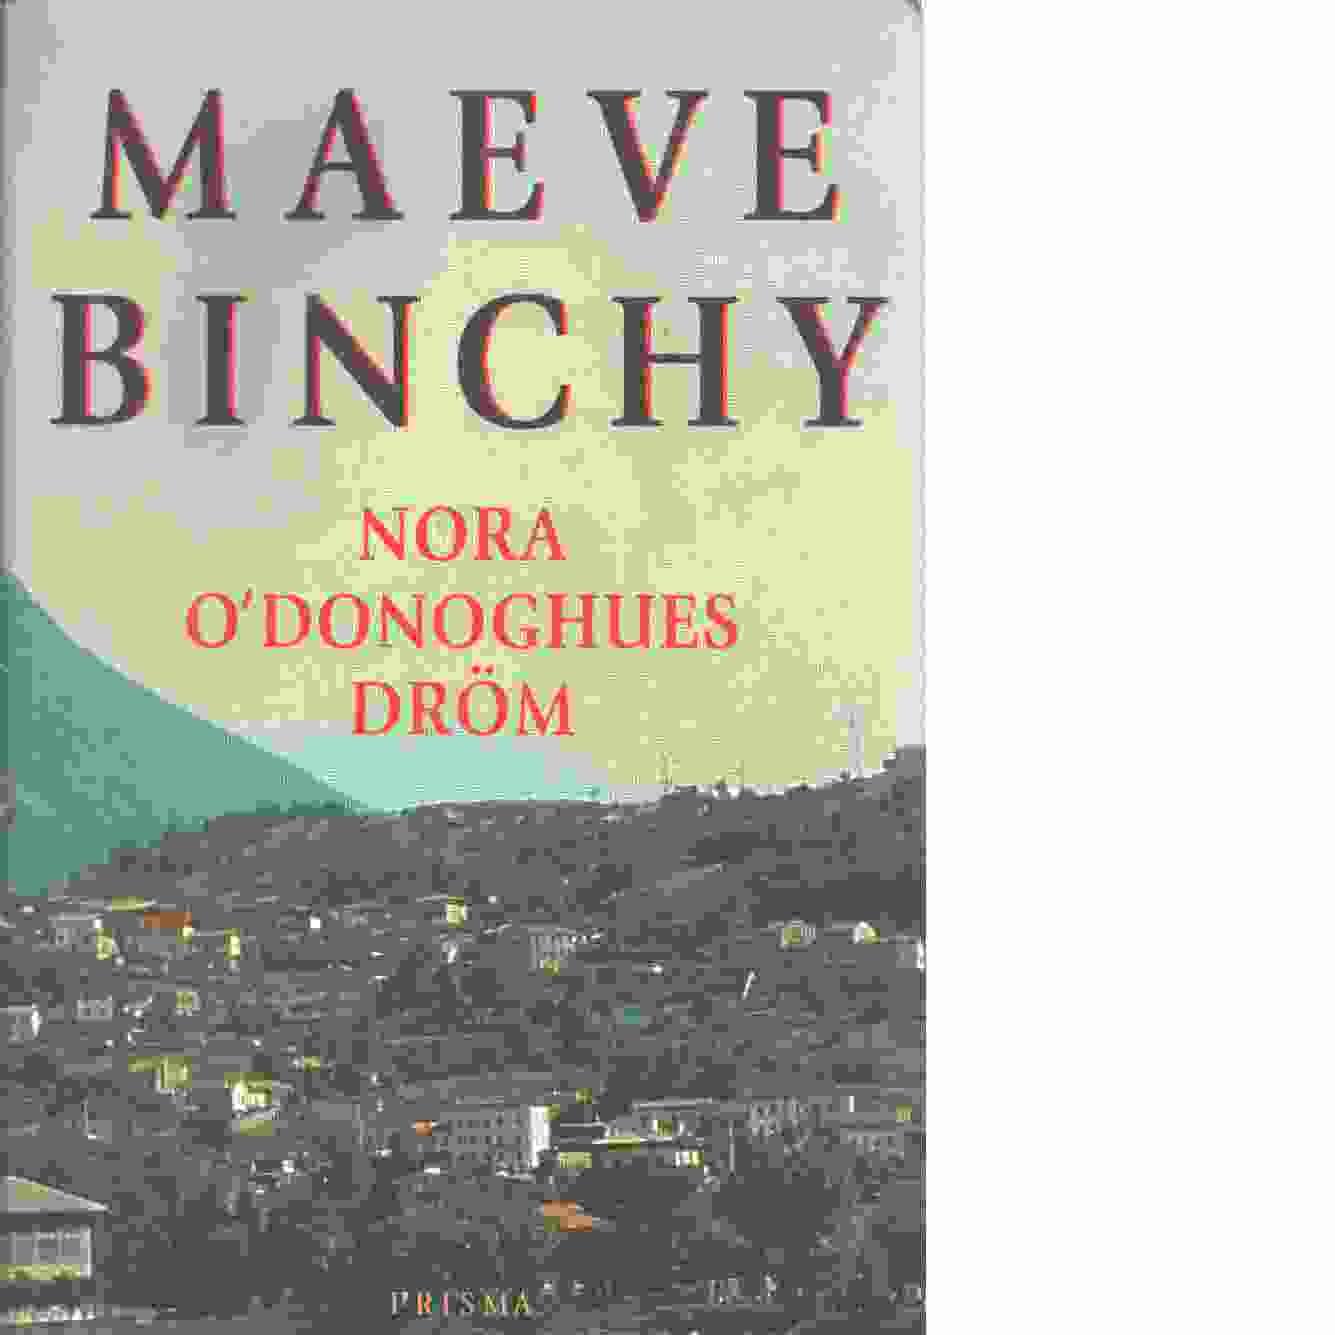 Nora O'Donoghues dröm  - Binchy, Maeve